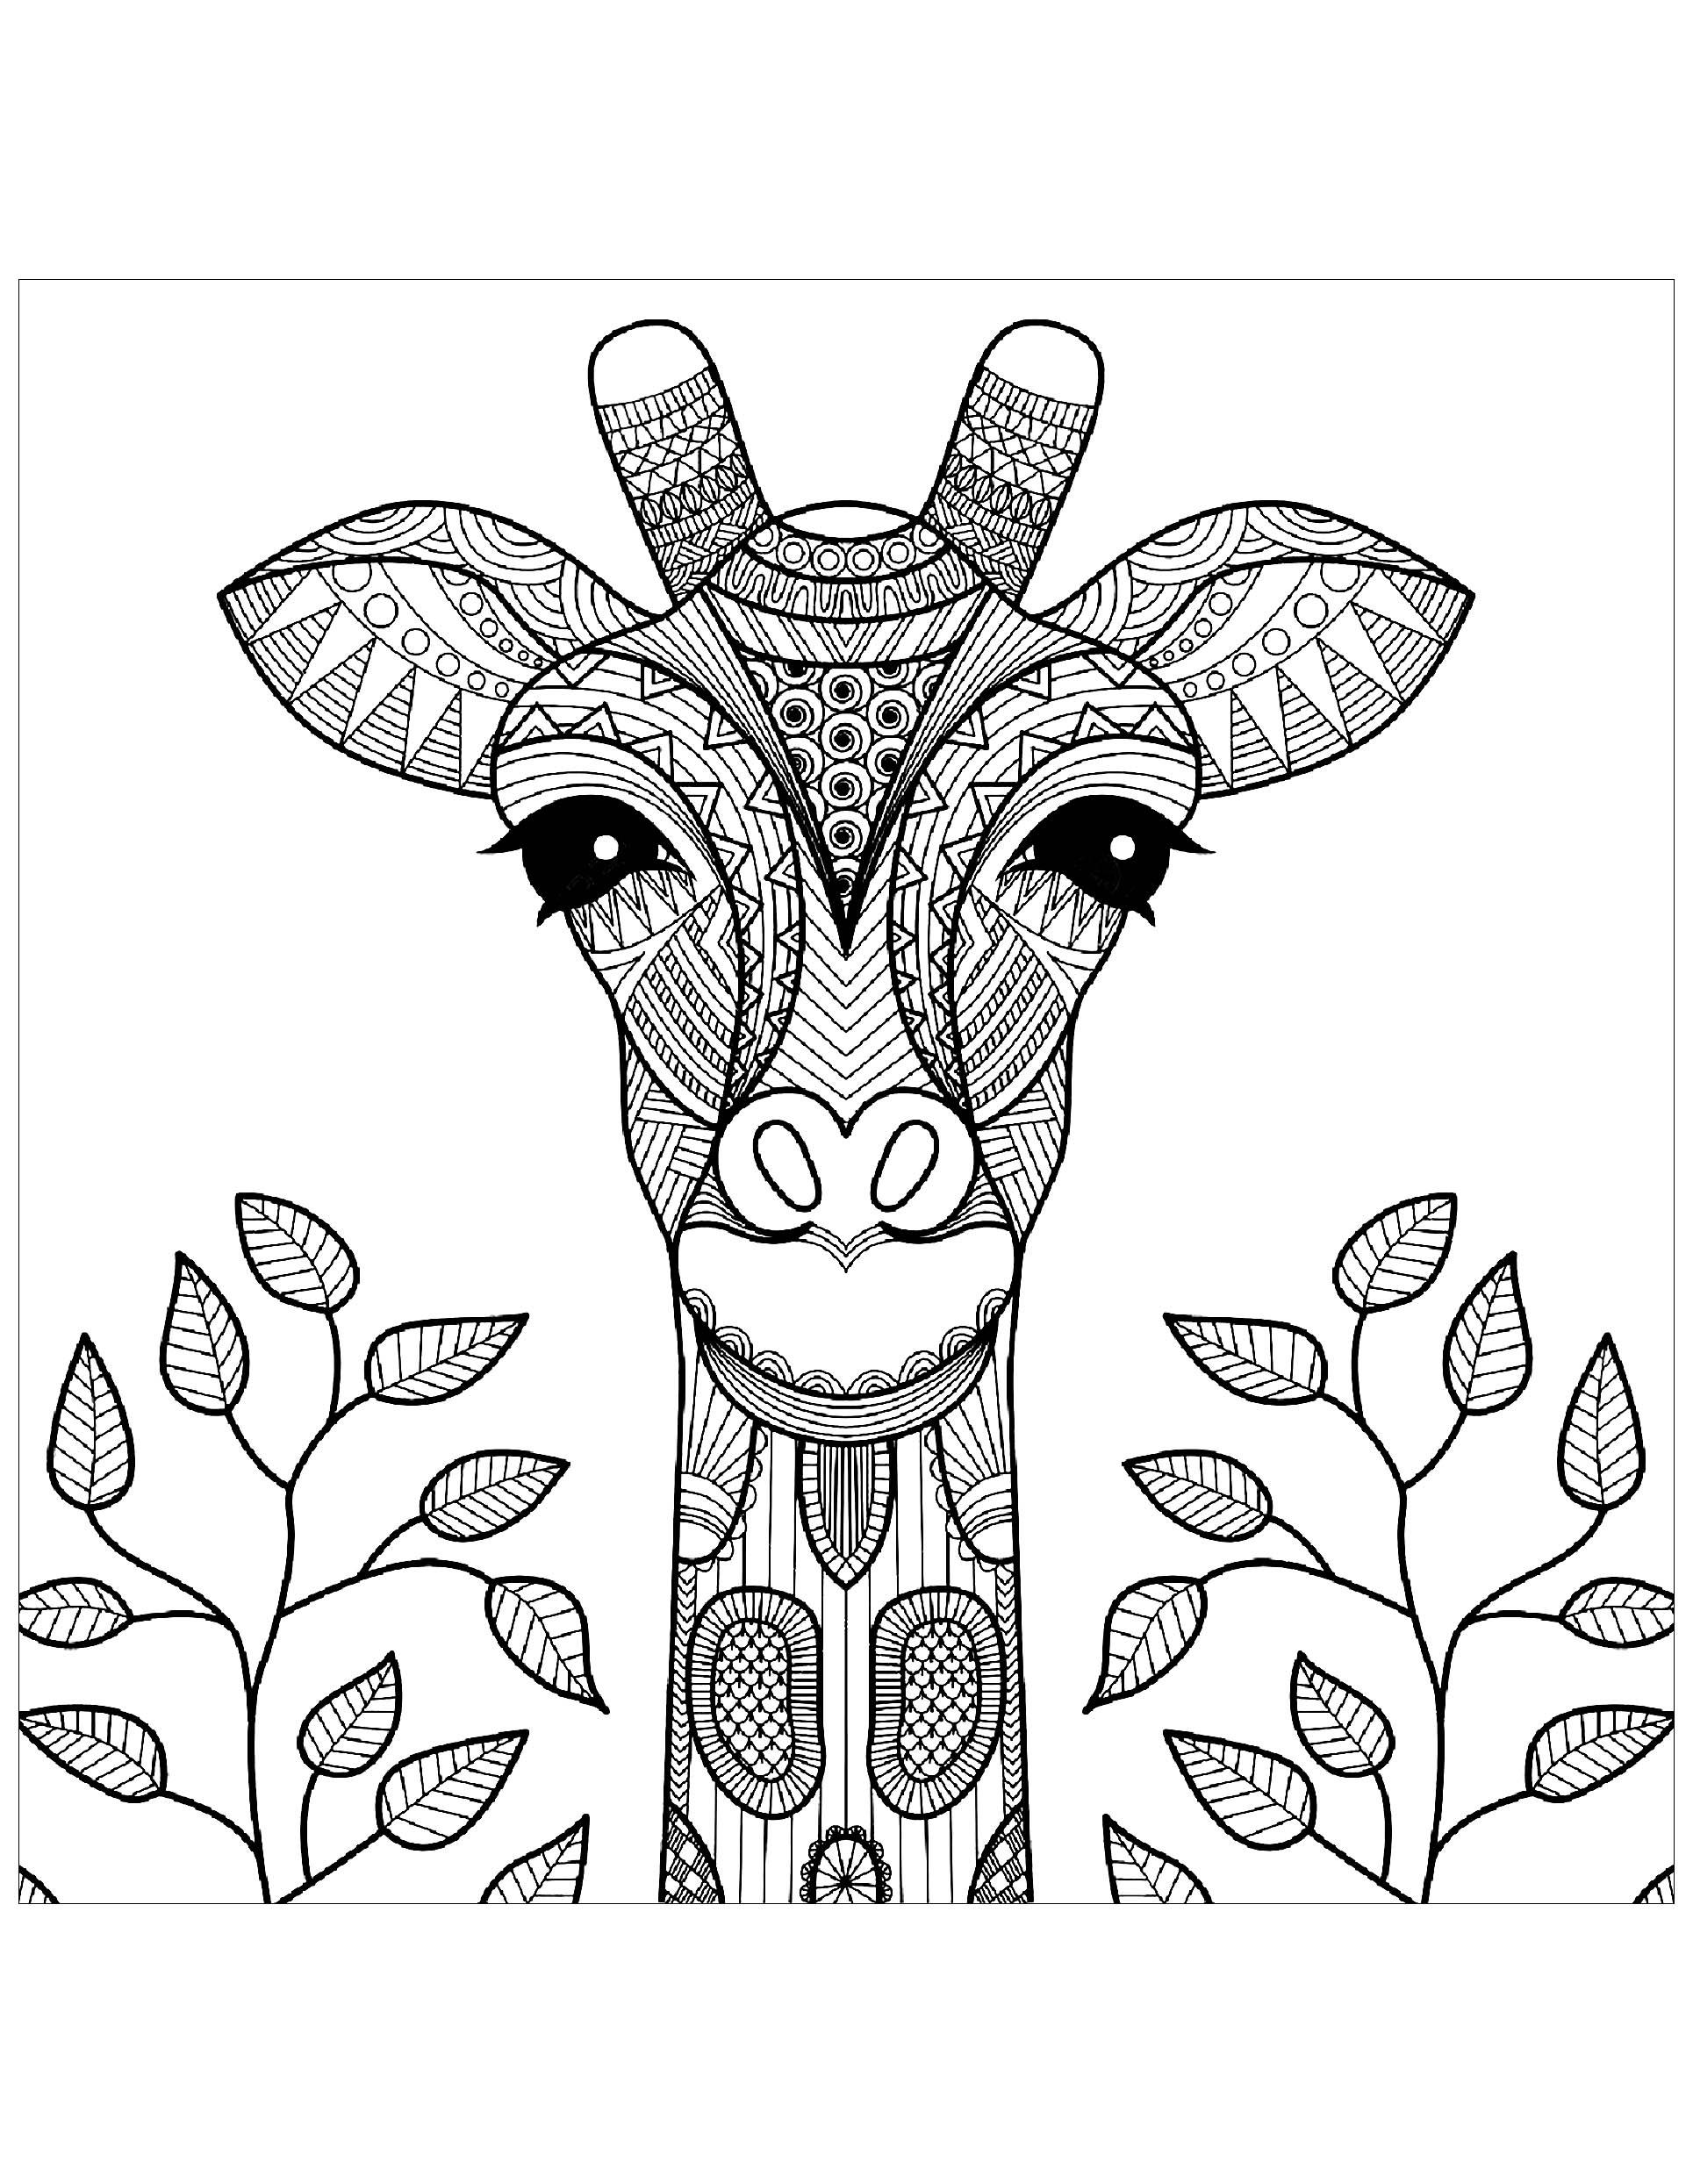 Tete de girafe et feuilles girafes coloriages for Giraffe mandala coloring pages